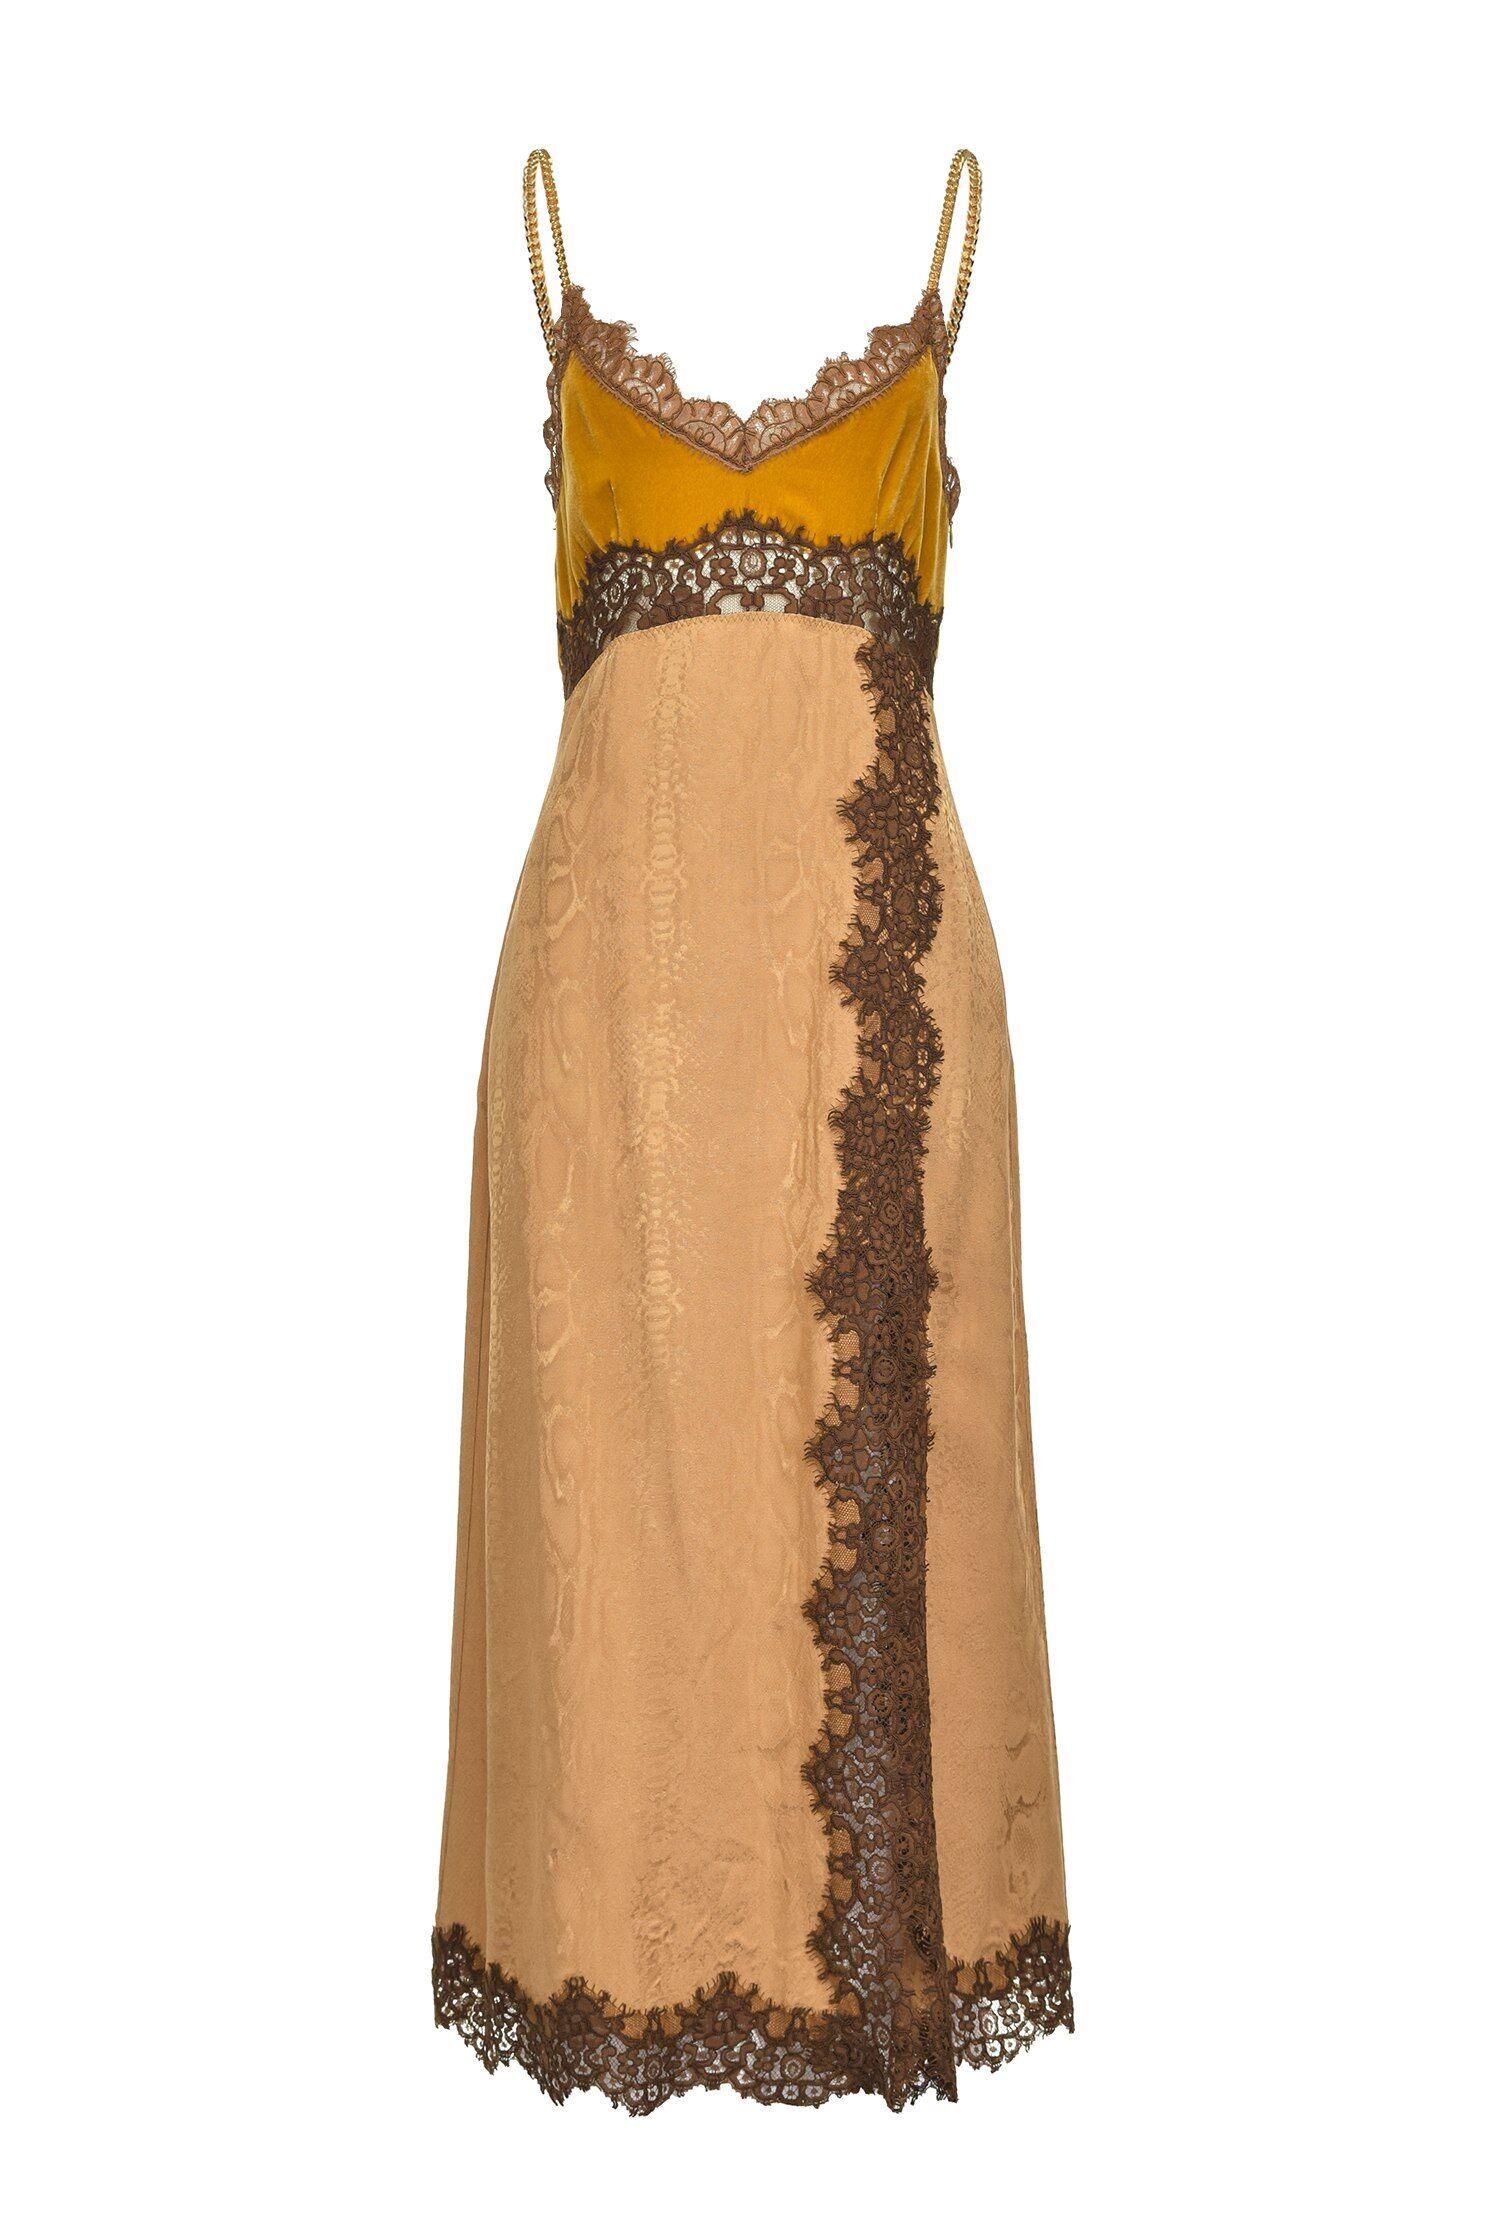 Jacquard Lingerie Dress Python Design - Pinko